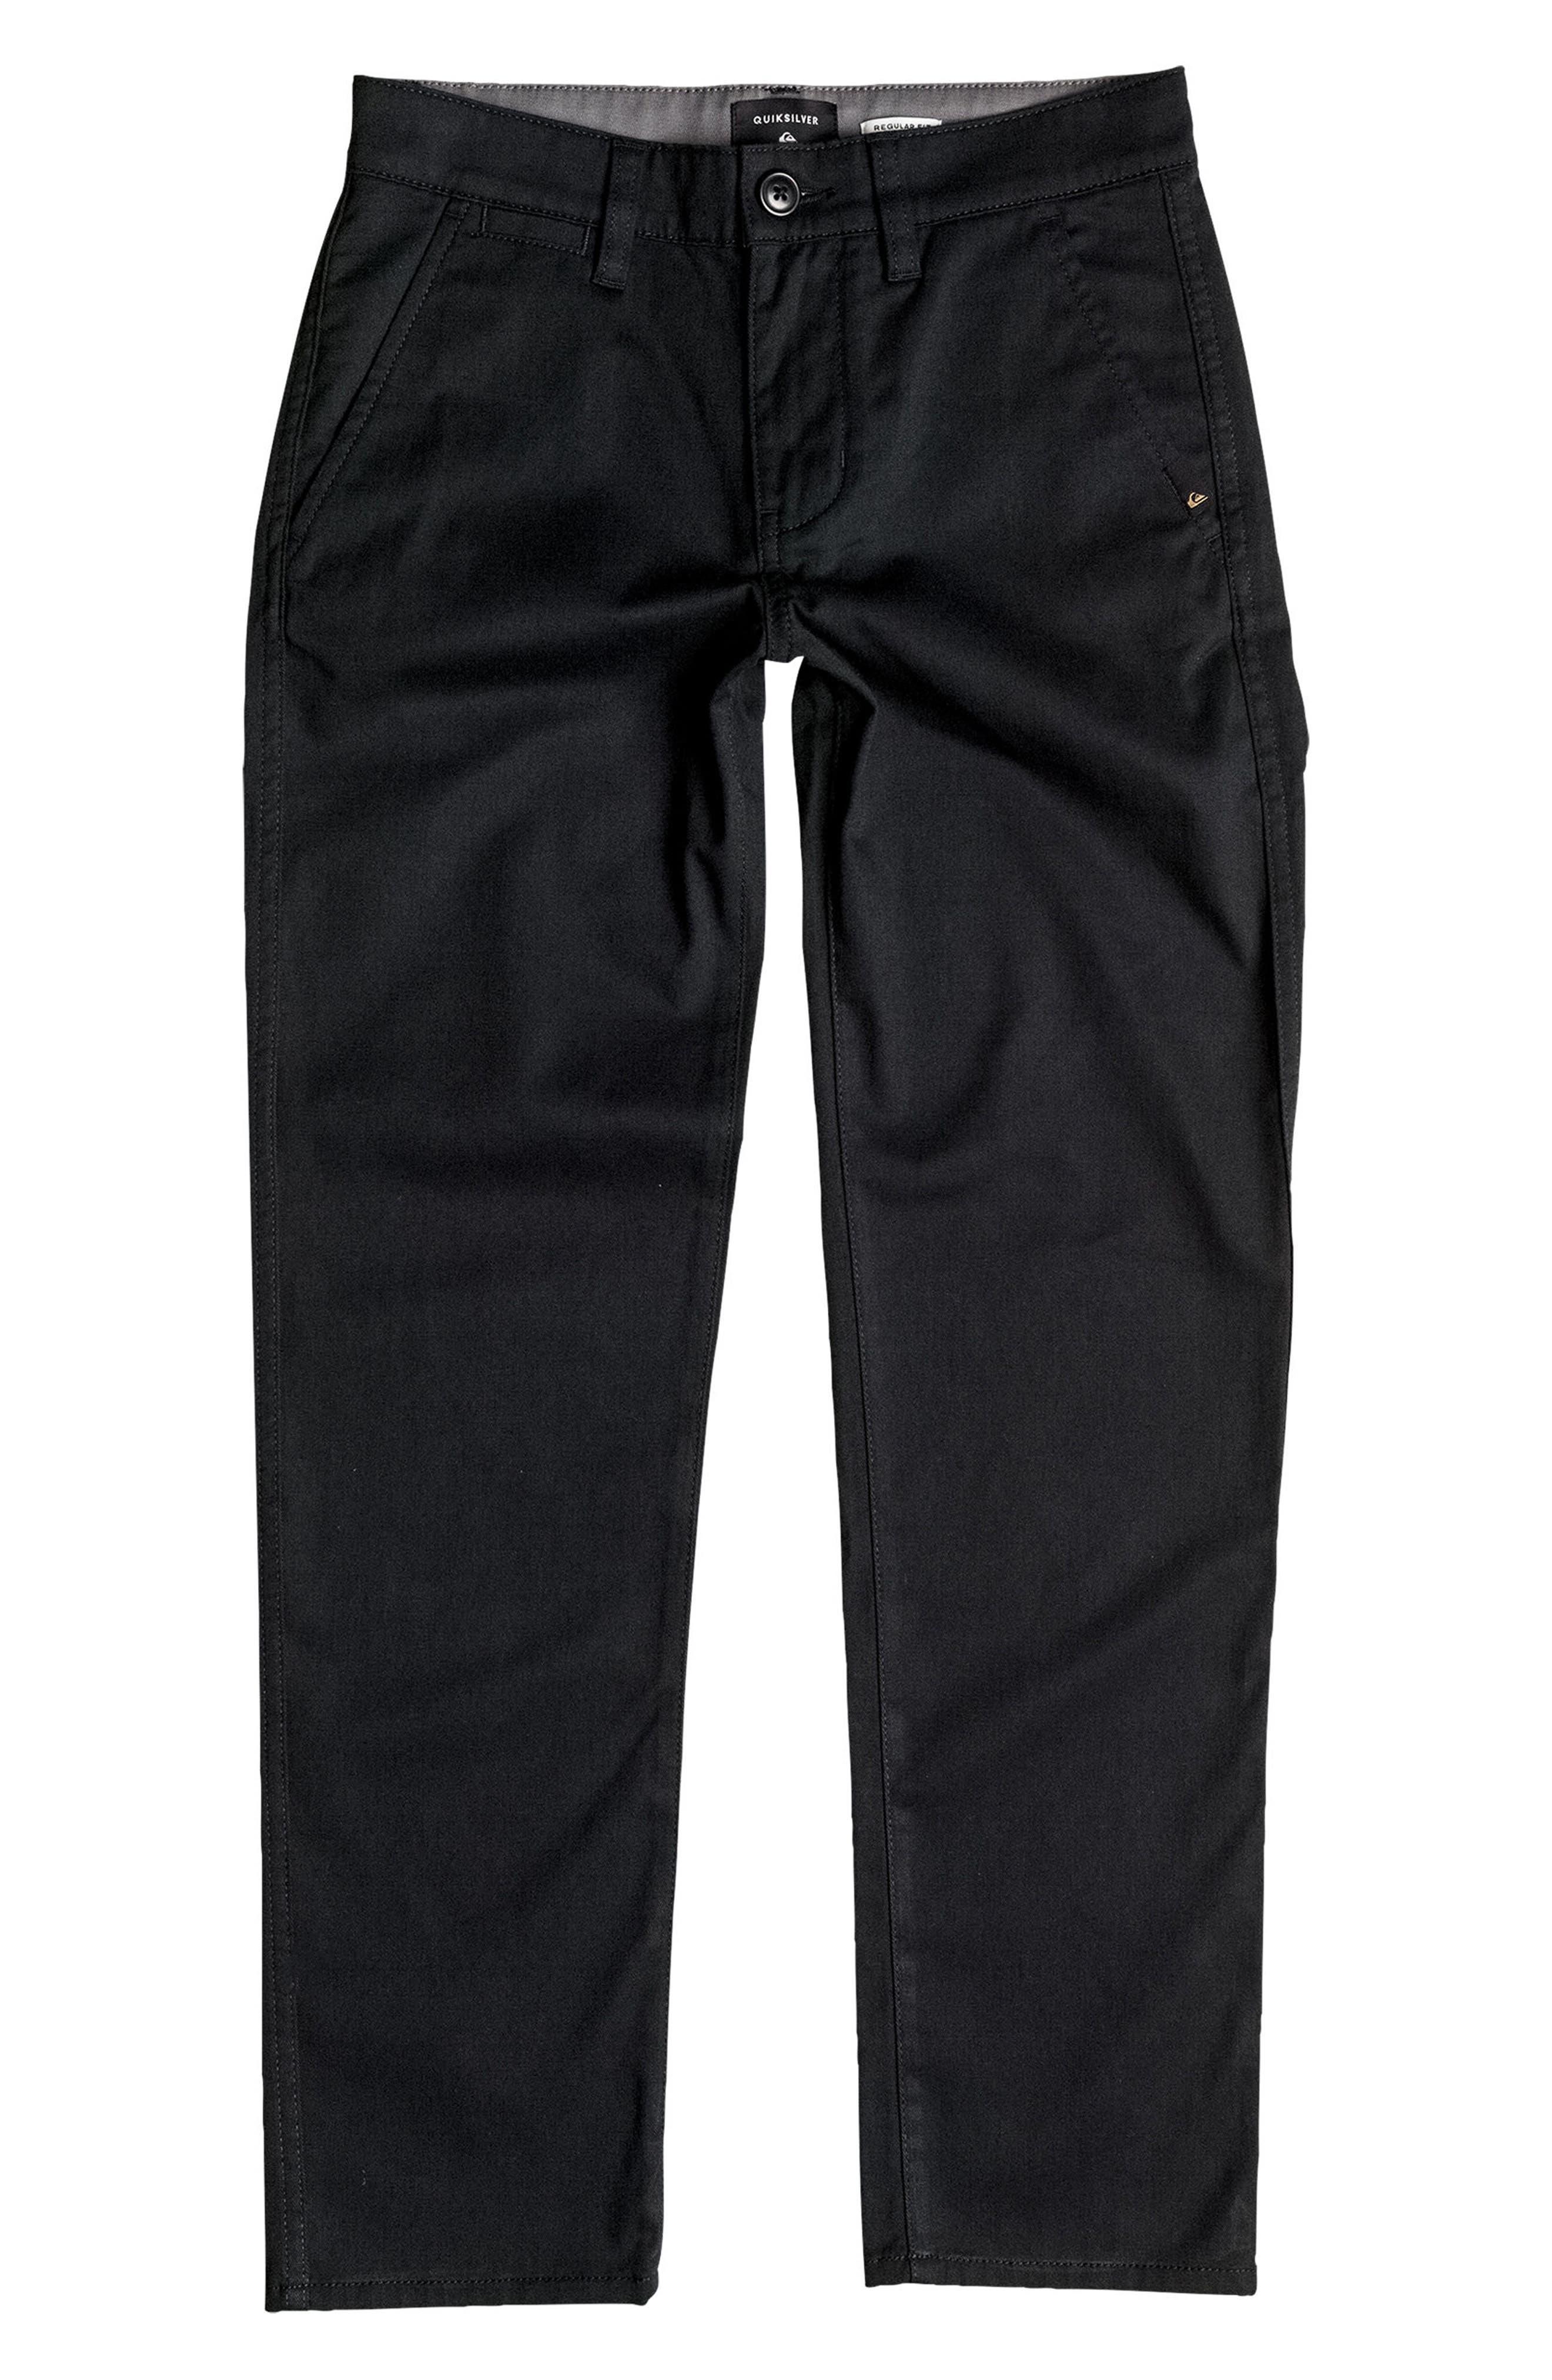 Quiksilver Regular Fit Everyday Union Pants (Big Boys)